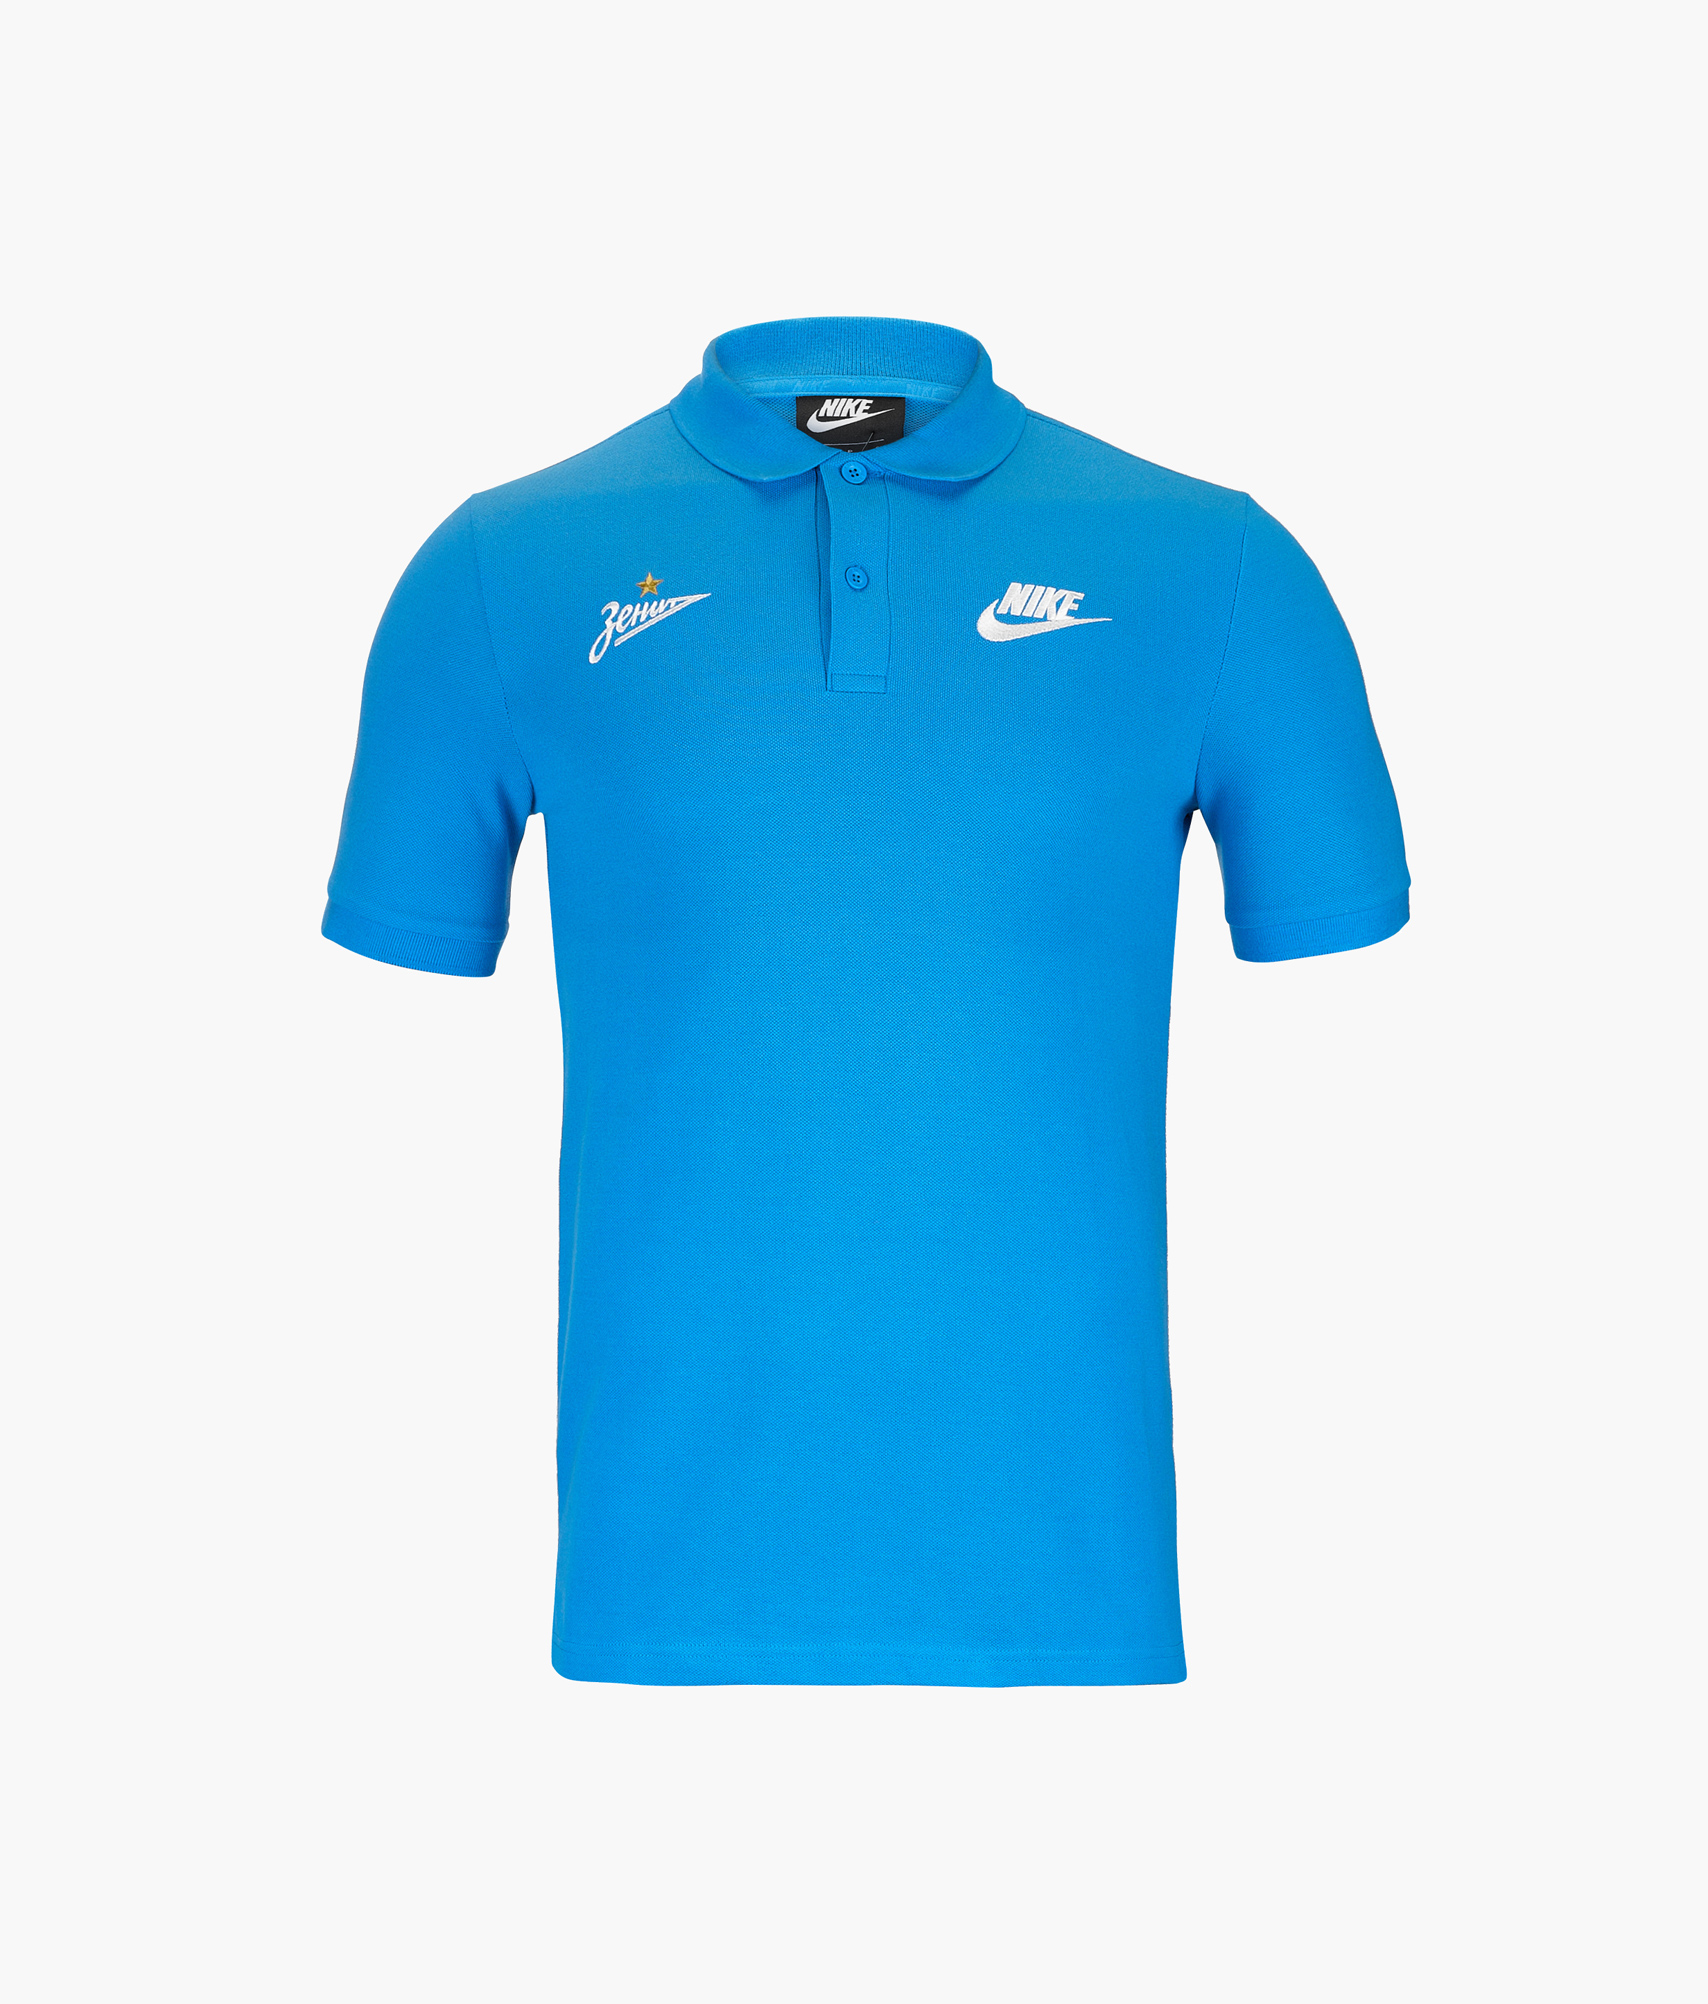 Поло Nike Nike Цвет-Синий цены онлайн